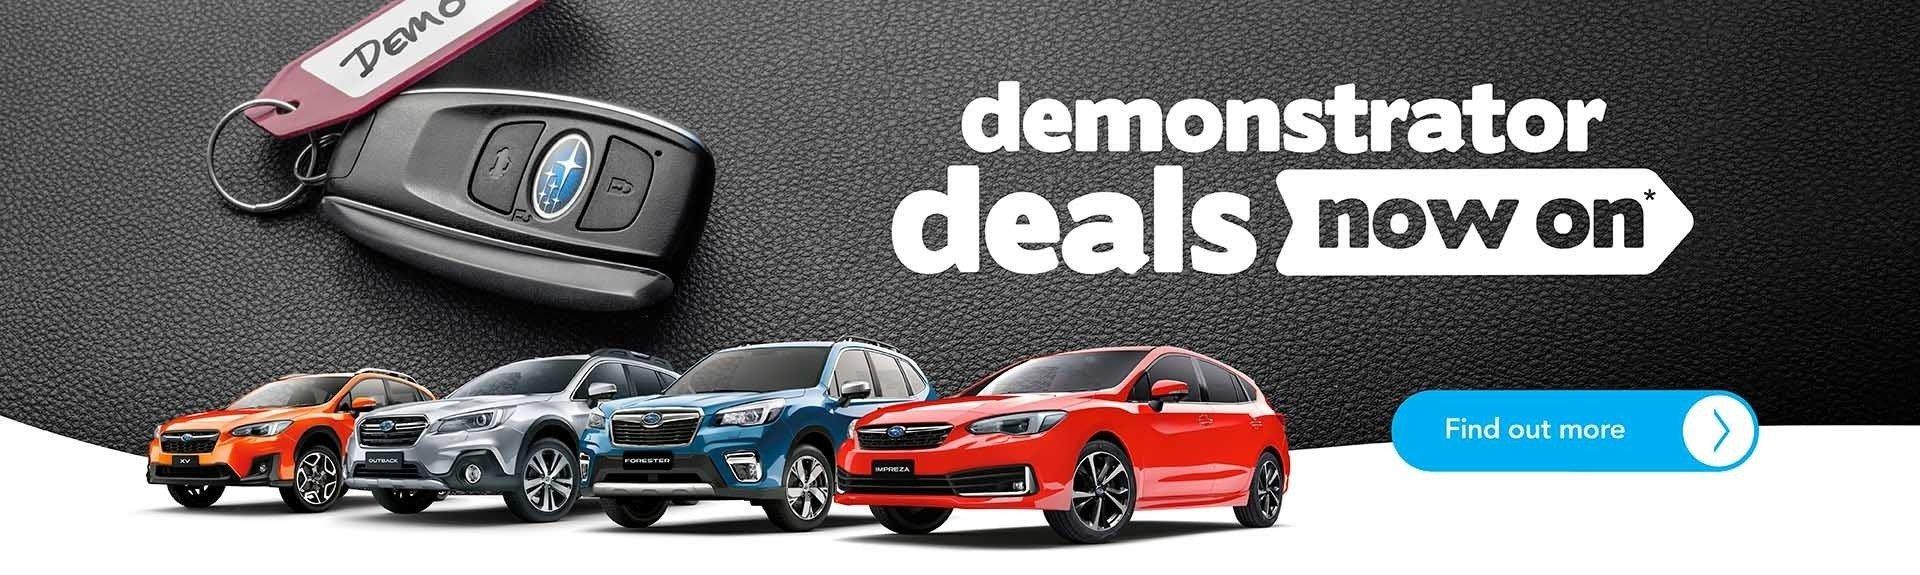 Subaru Mentone - Demonstrator Sale on now